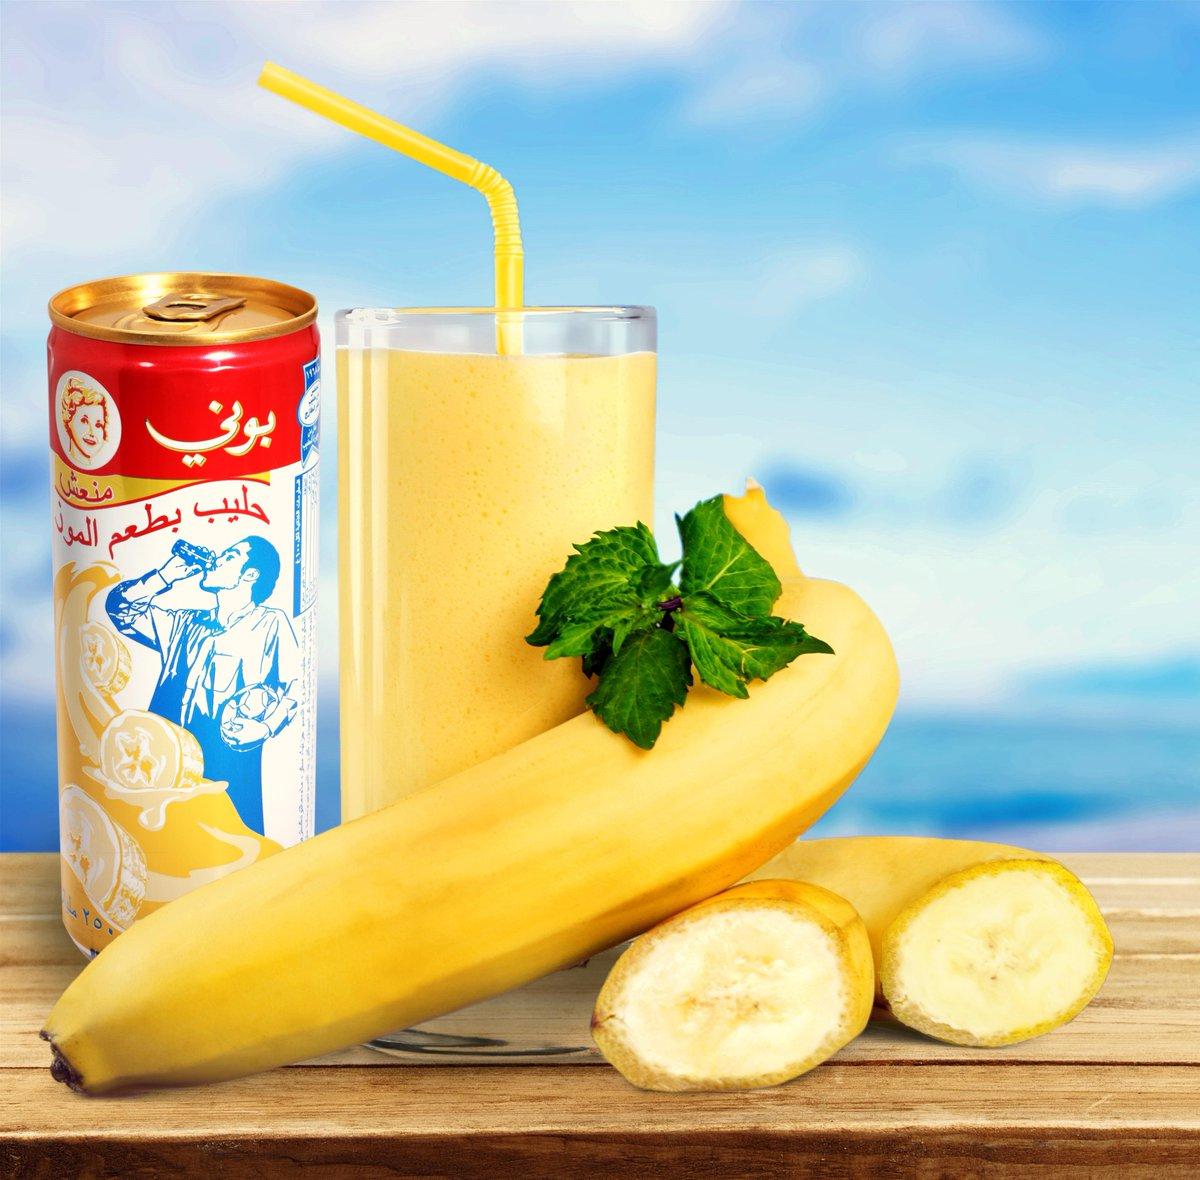 Bonny Milk حليب بوني A Twitter استمتع بيومك وانتعش في هذا الصيف مع حليب بوني بنكهة الموز Http T Co 1bwx9bl7bo